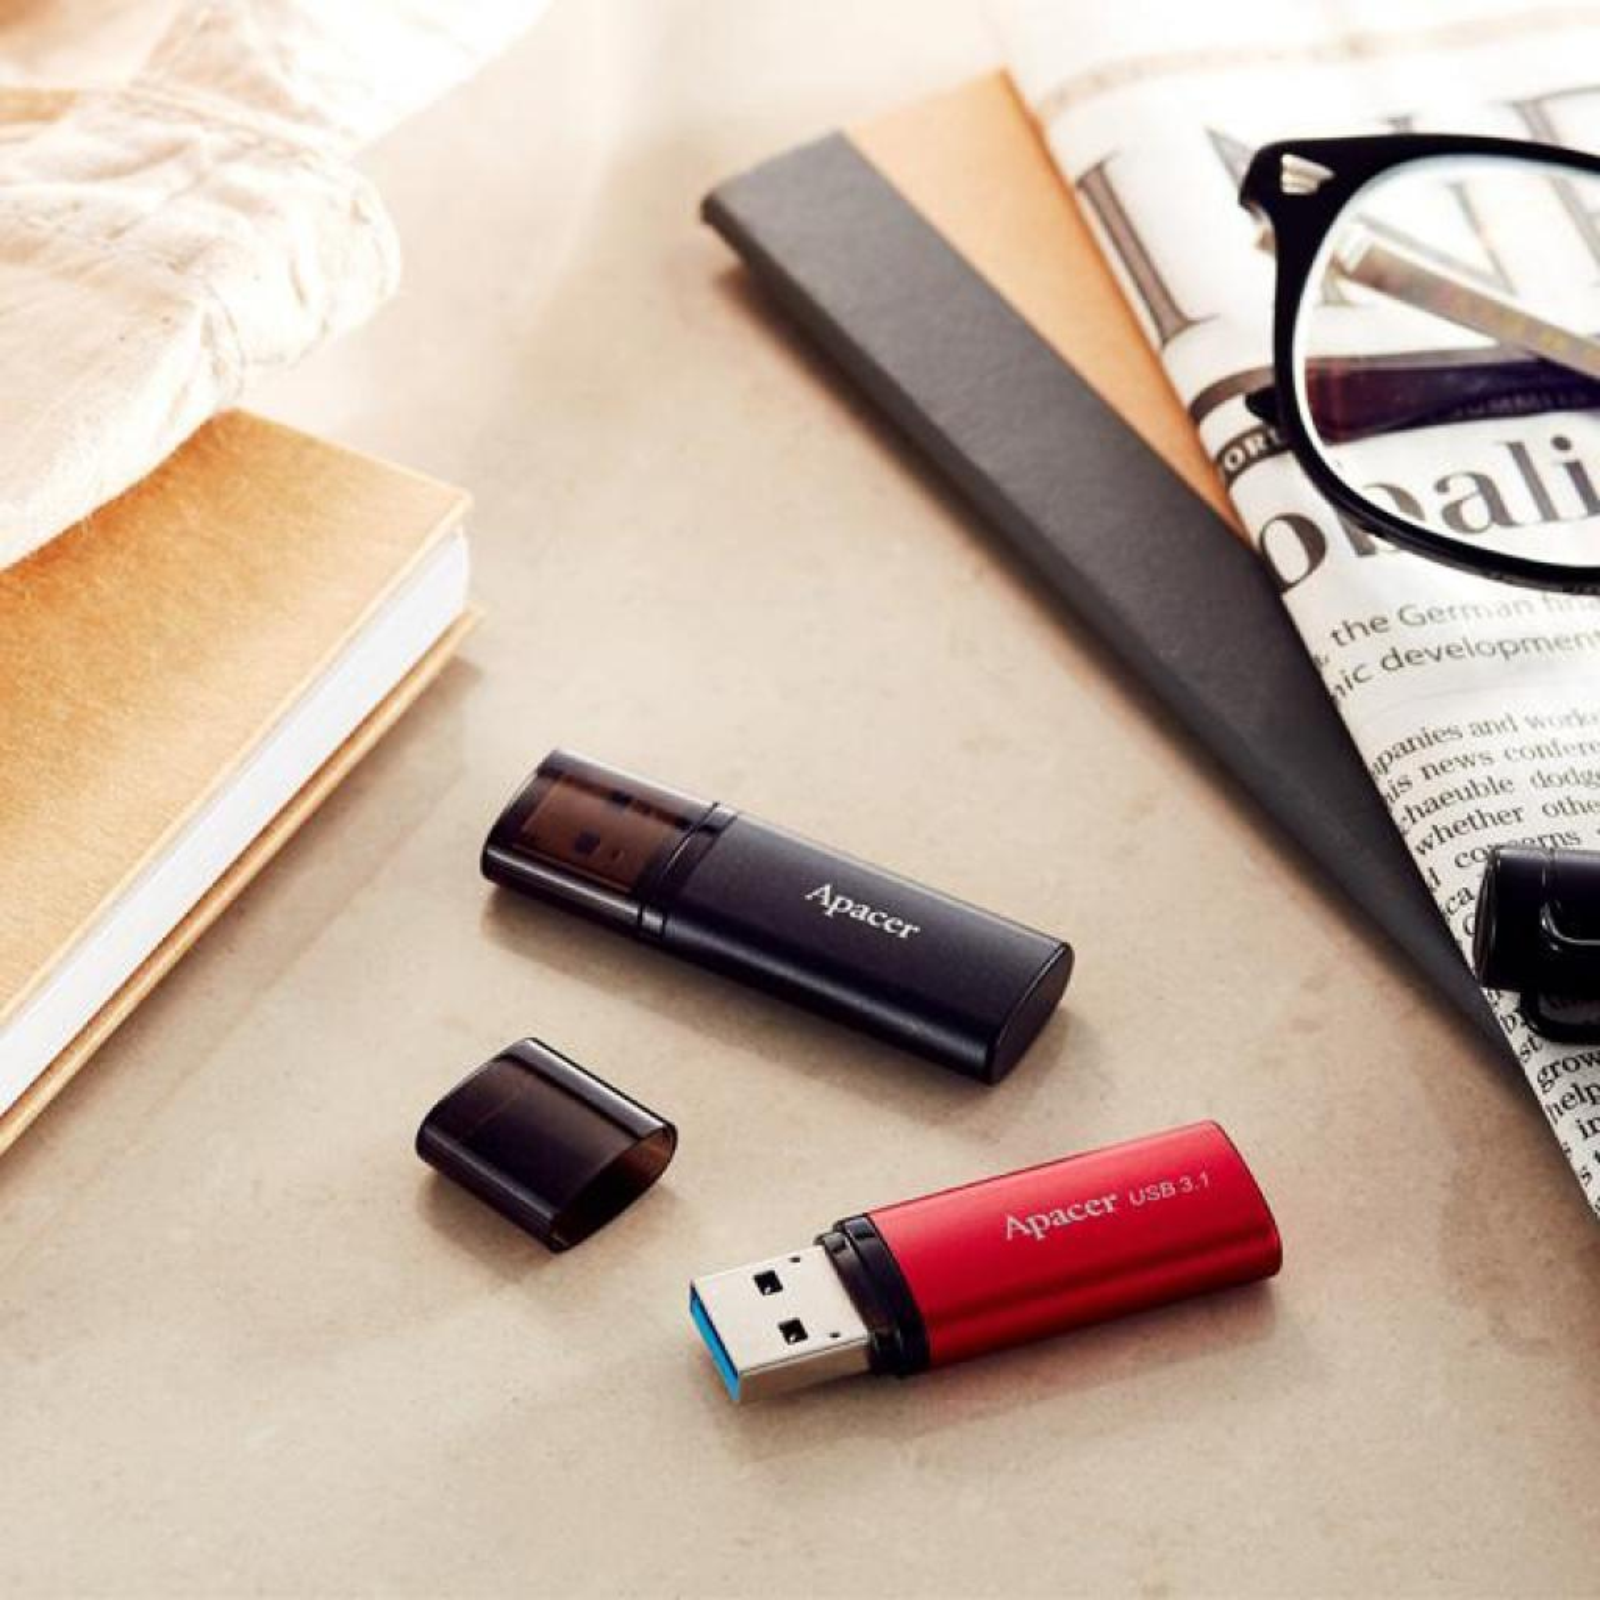 USB флеш накопитель Apacer 32GB AH25B Red USB 3.1 Gen1 (AP32GAH25BR-1) изображение 5